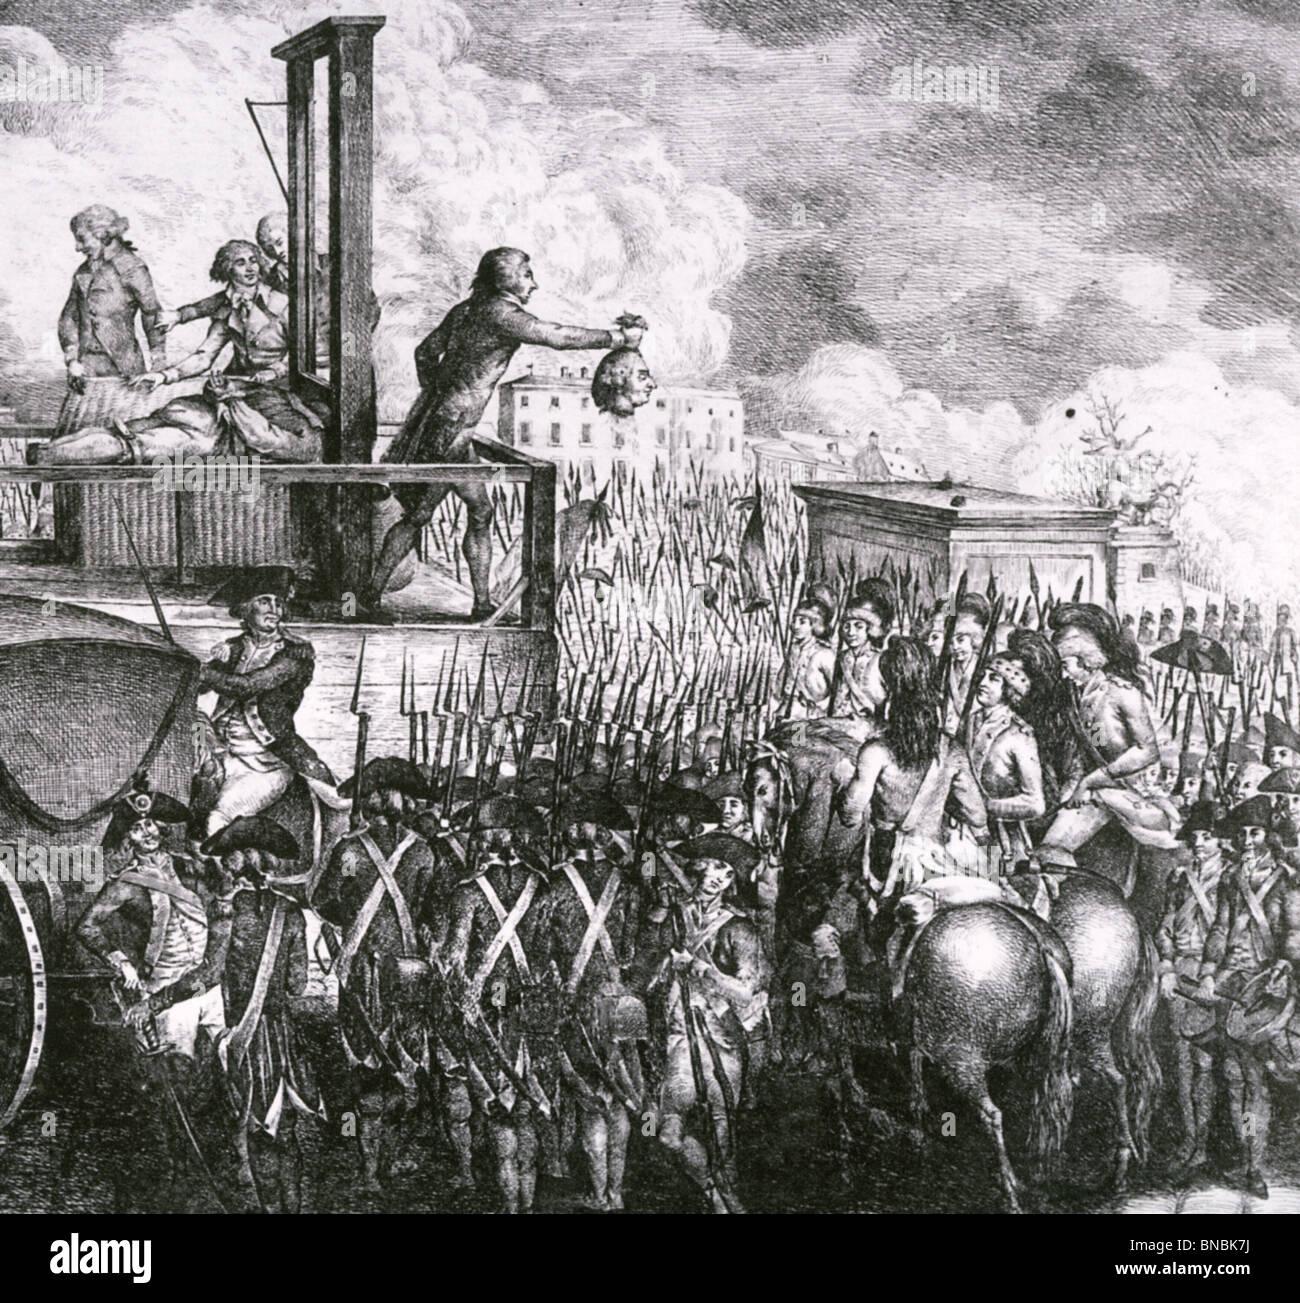 EXECUTION OF LOUIS XVI in Paris, 21 January 1793 - Stock Image